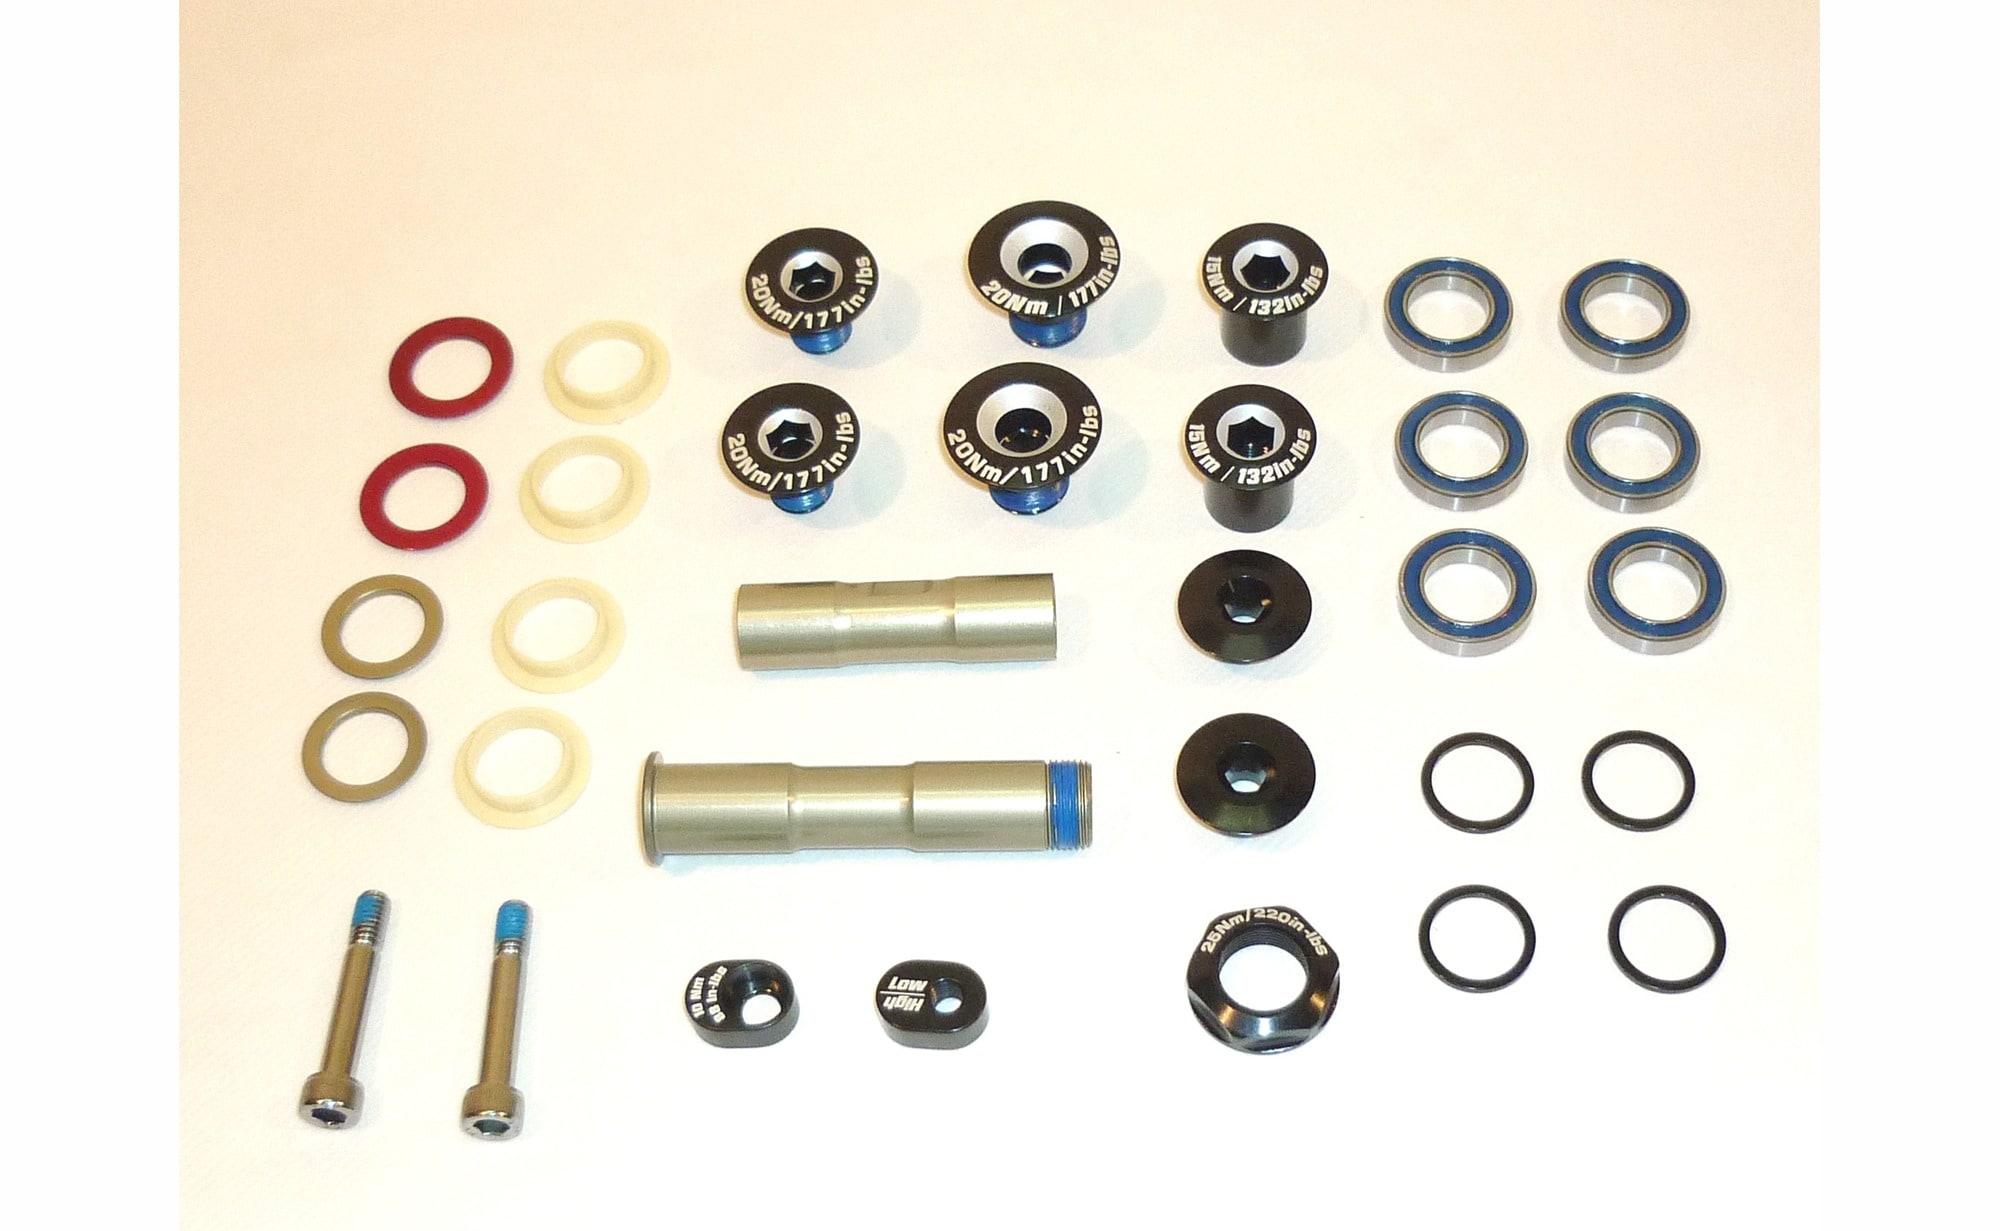 Scott Bult Kit, Swingarm Repair Kit Spark >2012 / Genius >2013